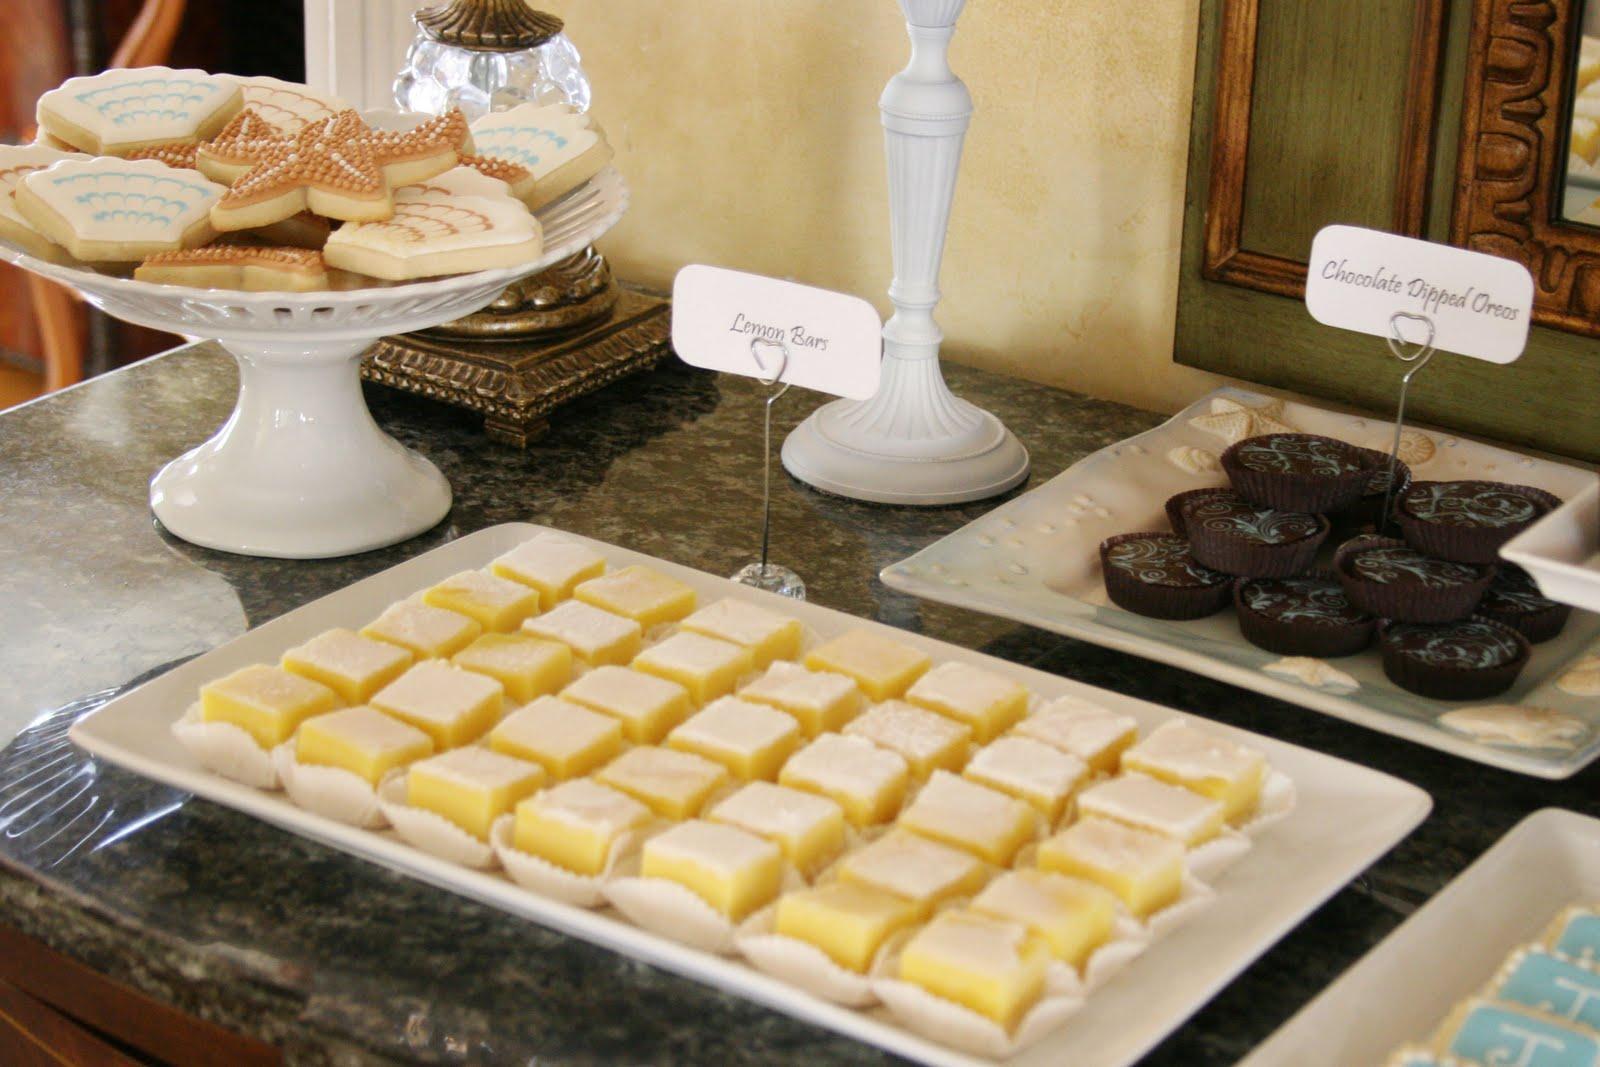 beach wedding cake and dessert table glorious treats. Black Bedroom Furniture Sets. Home Design Ideas